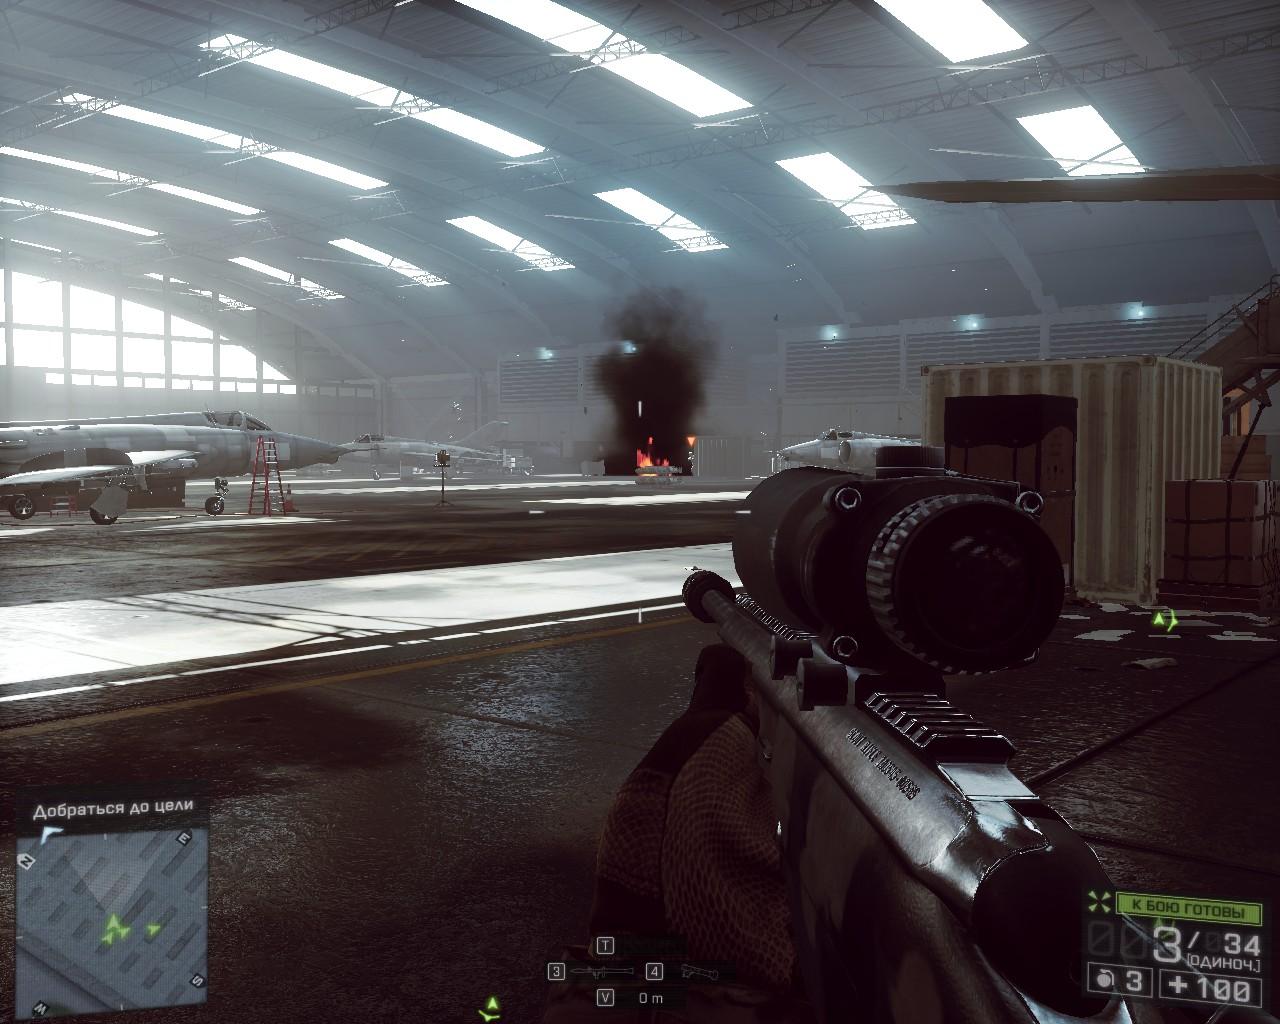 bf4 2014-04-05 01-52-04-85.jpg - Battlefield 4